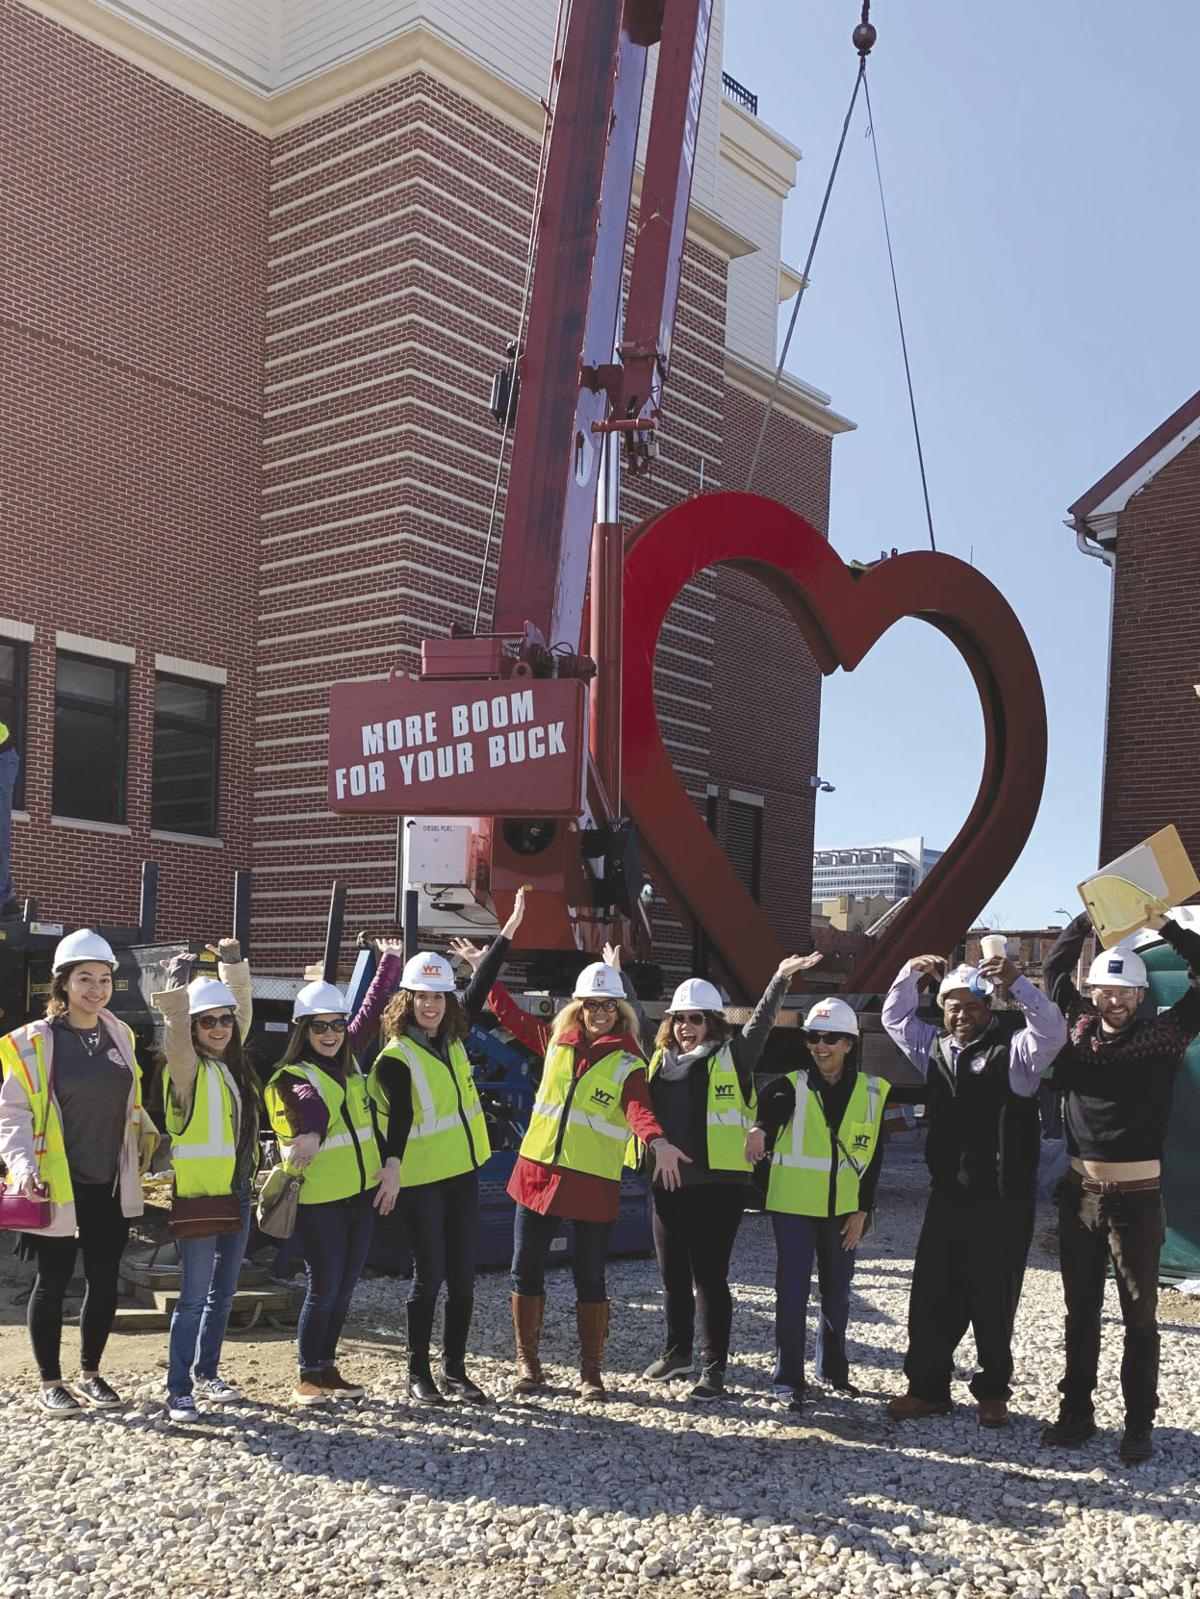 RMHC Maryland Heart Lift 2.15.19 - Staff.jpg